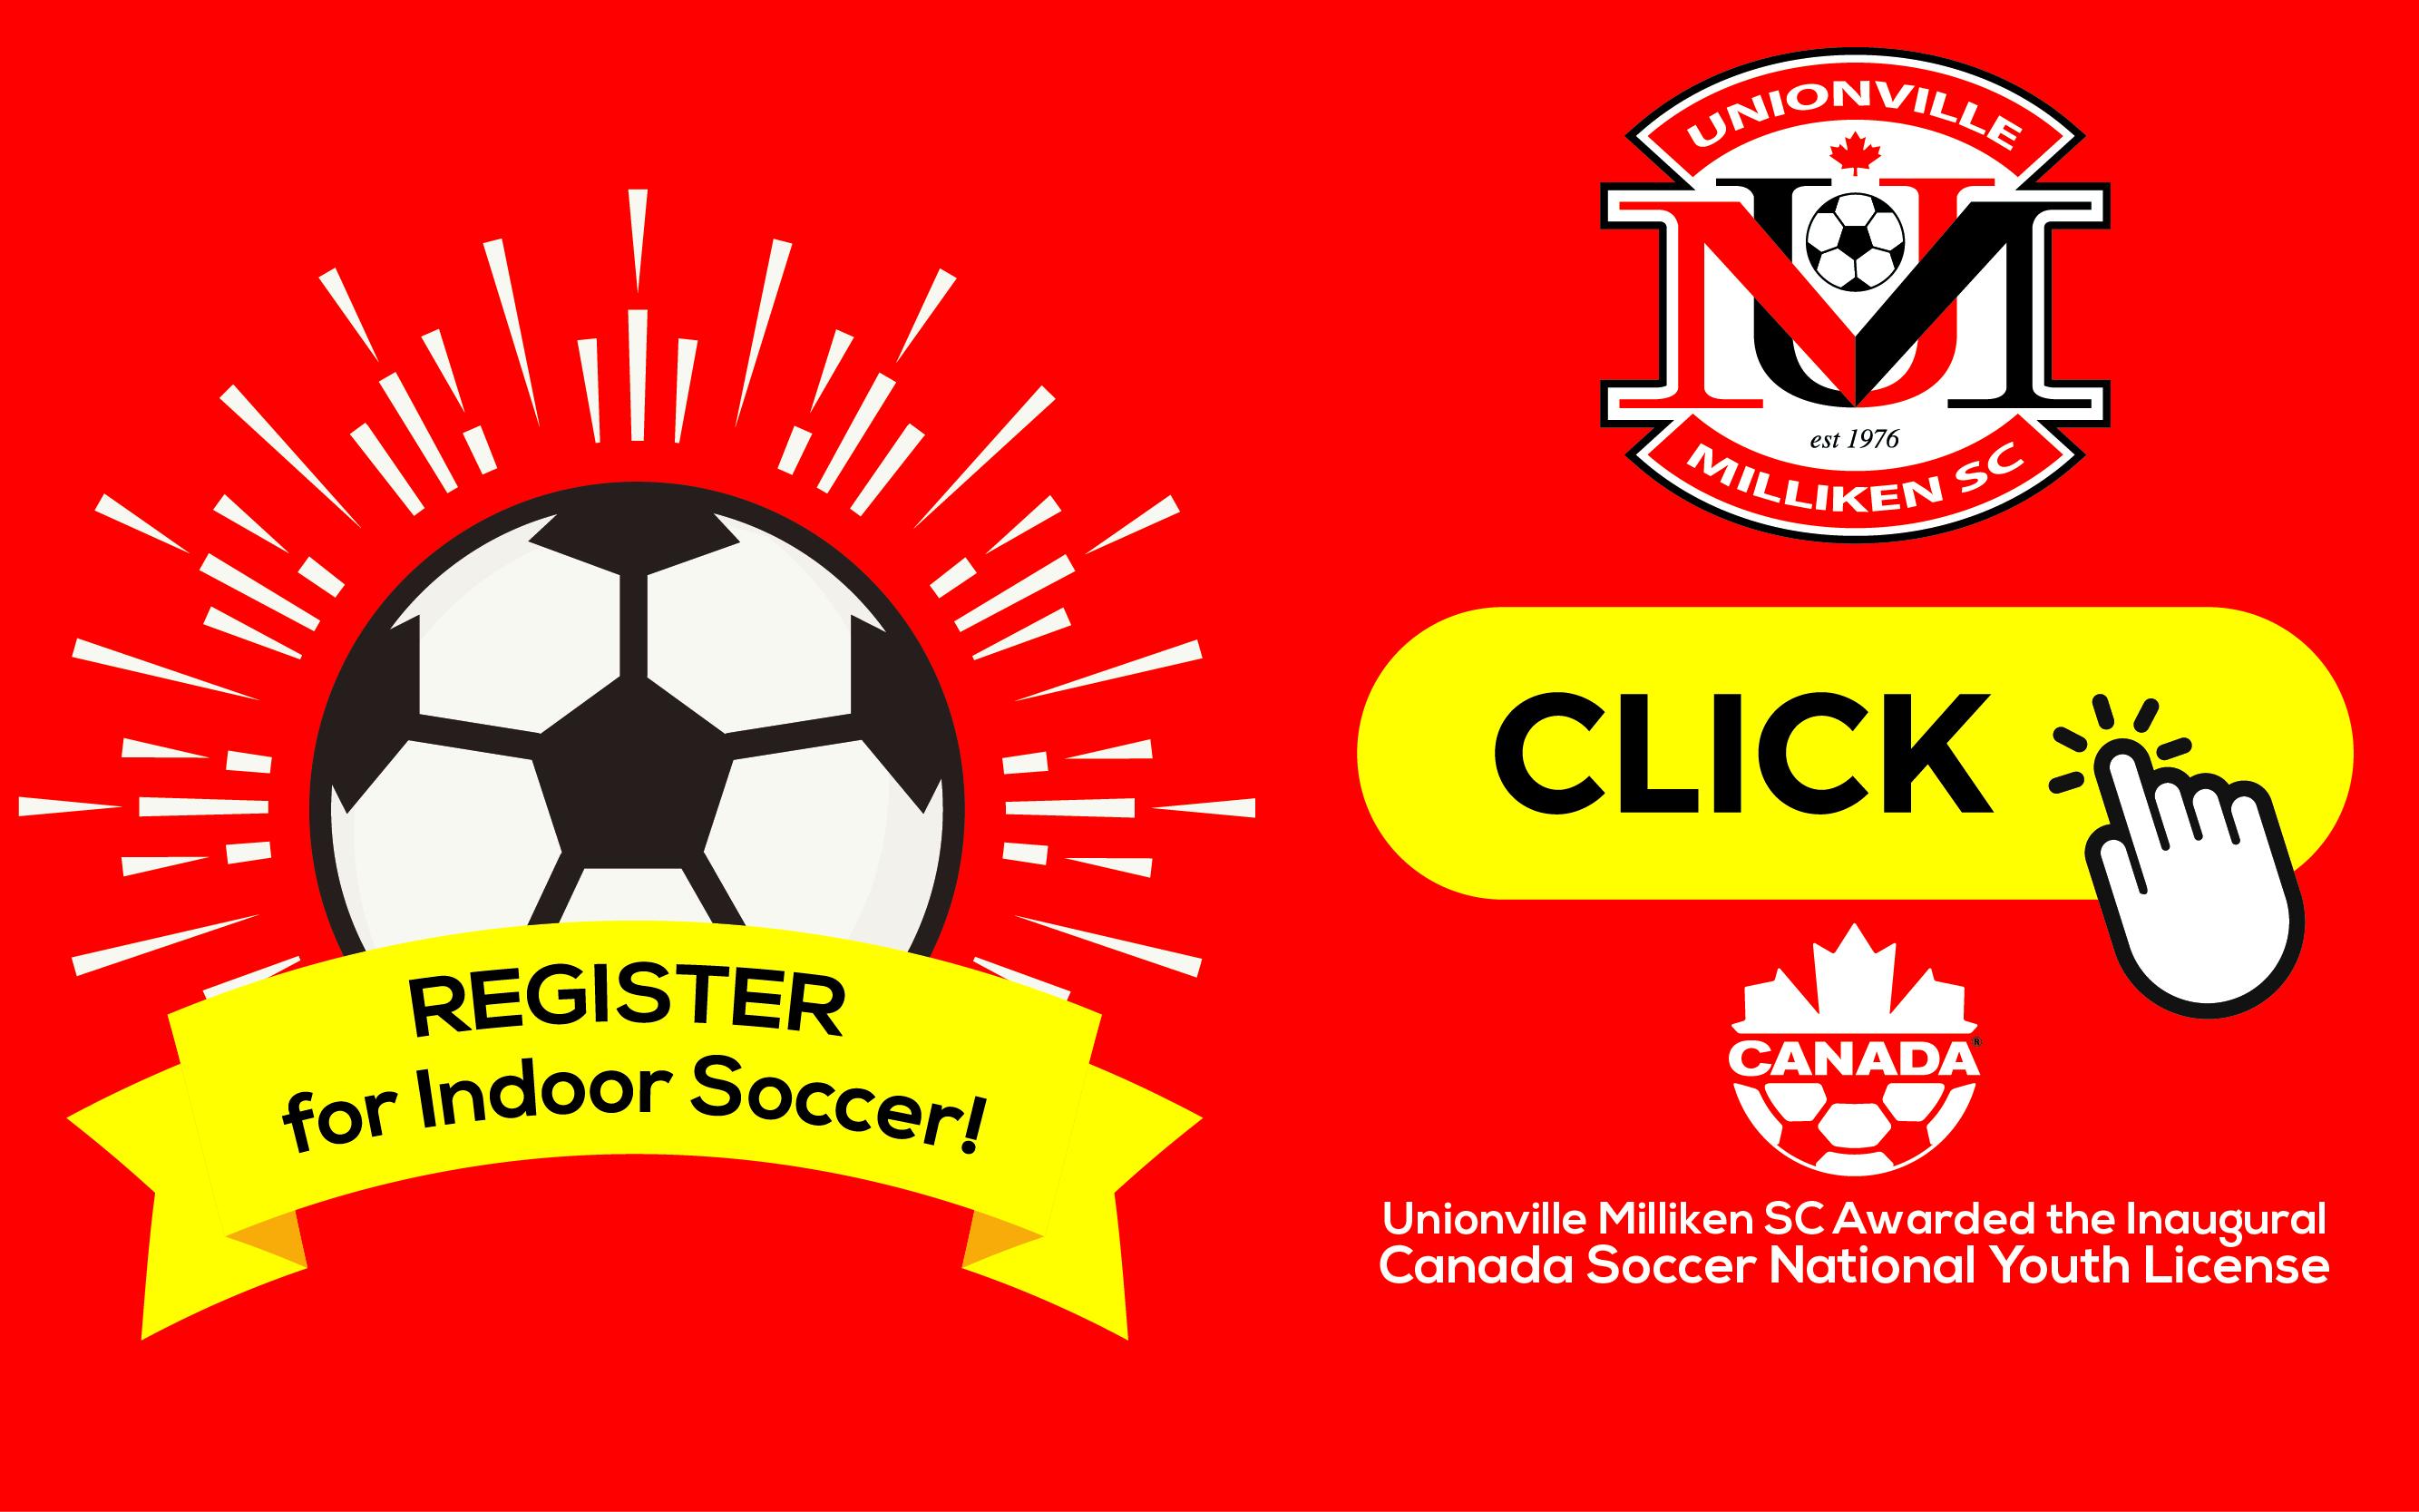 Unionville Milliken Soccer Club - Home